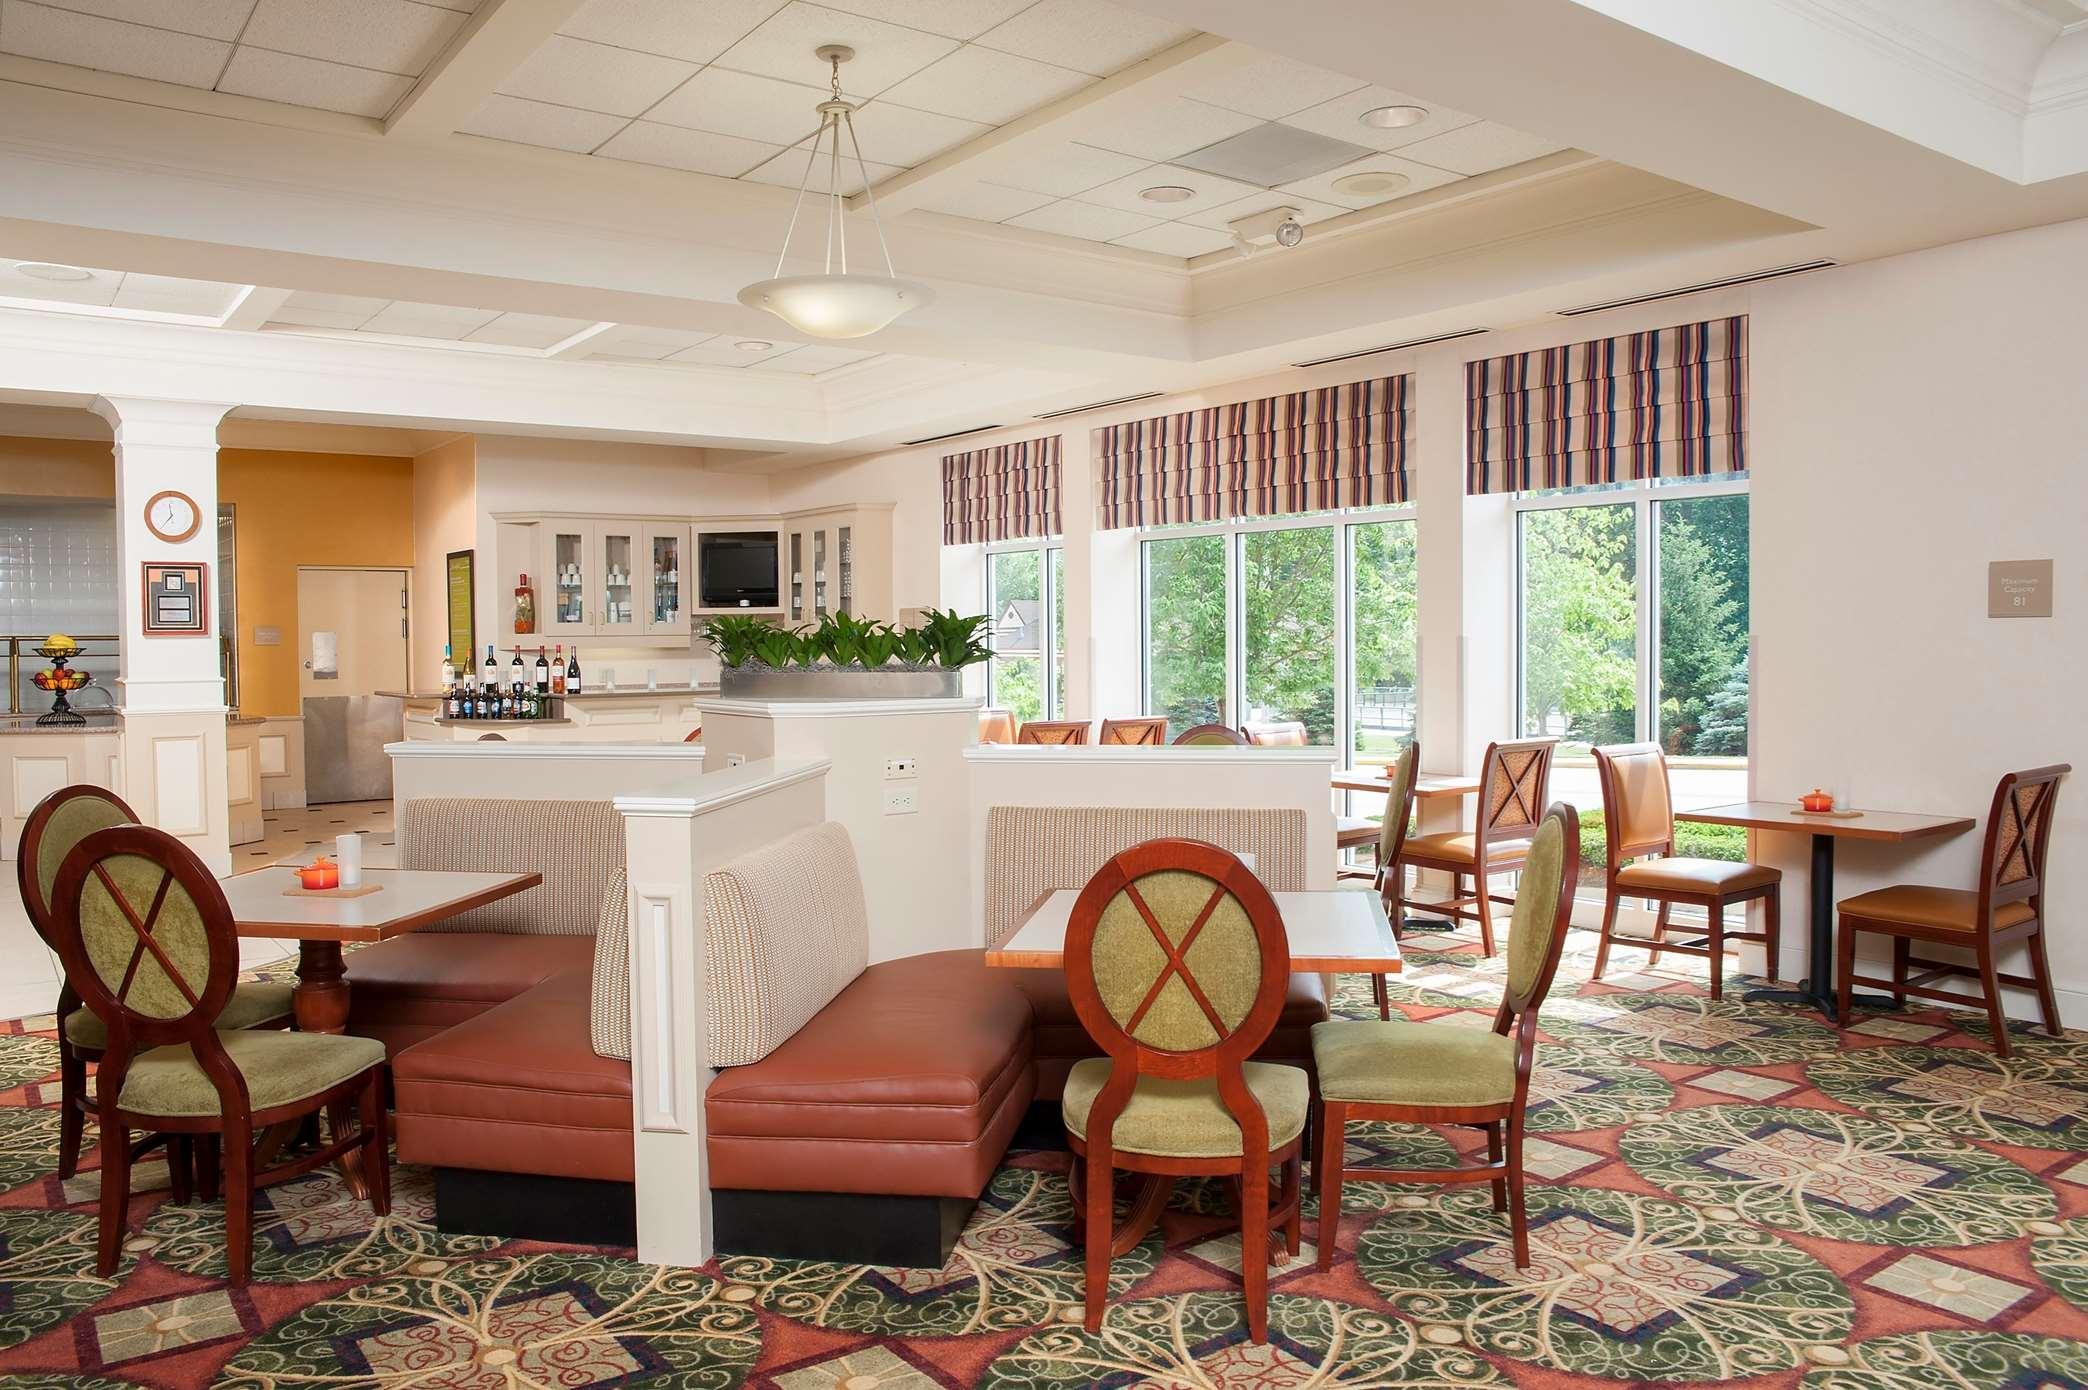 Hilton garden inn west lafayette wabash landing west lafayette indiana for Hilton garden inn west lafayette